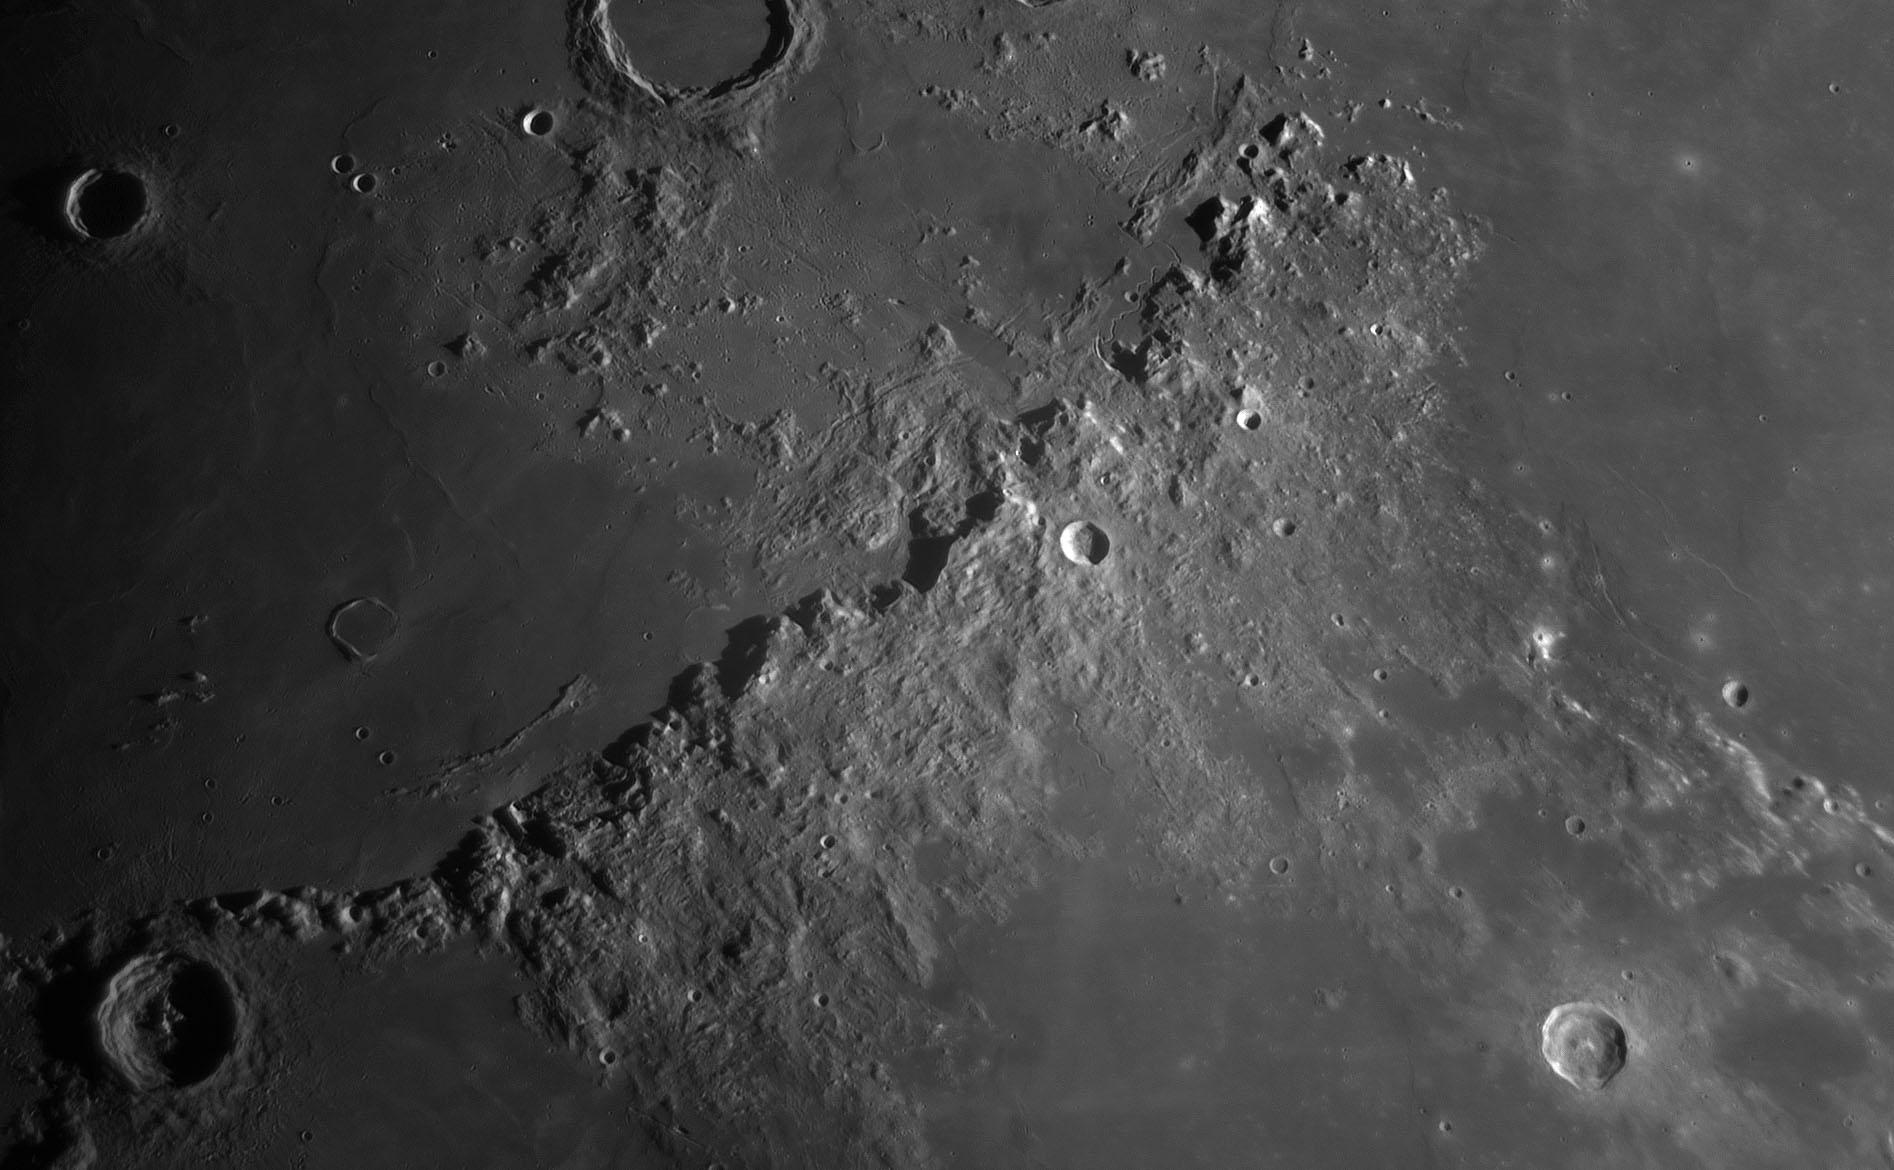 2019 04 13 Monts Apennins .jpg